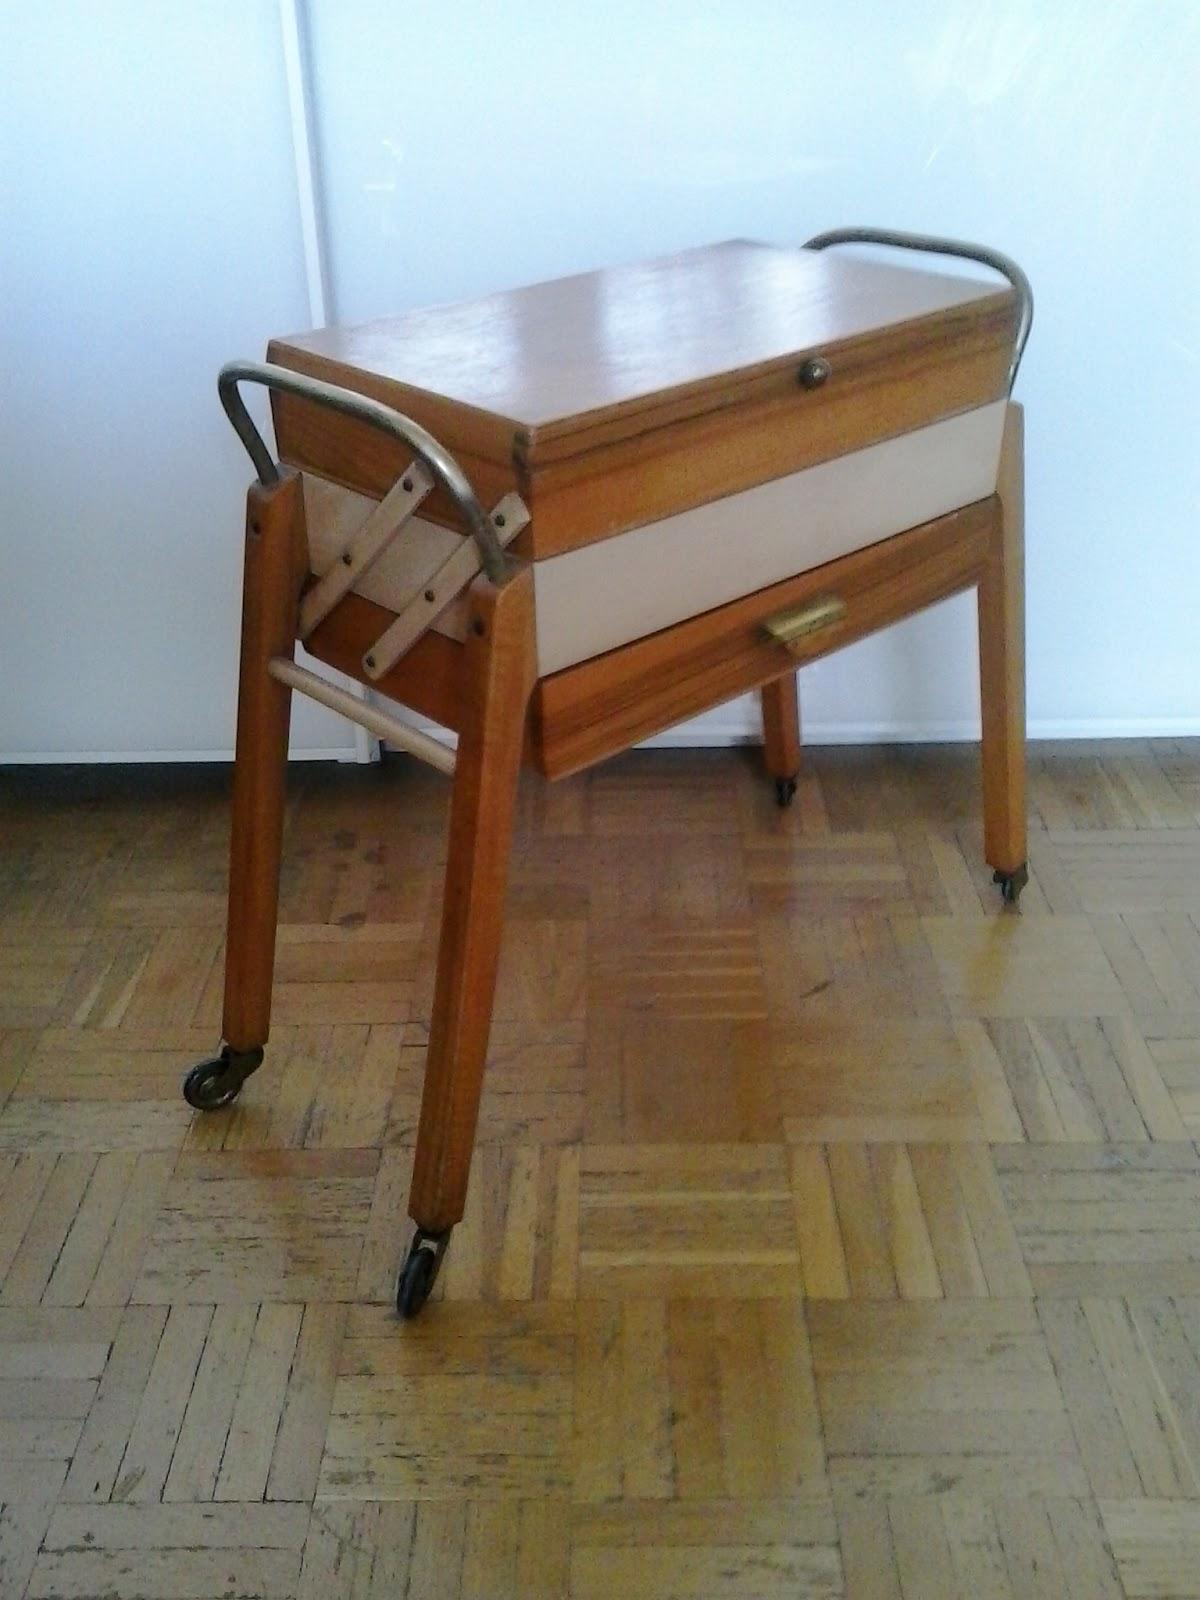 Area vintage dise o mueble auxiliar dise o a os 50 - Mueble anos 50 ...